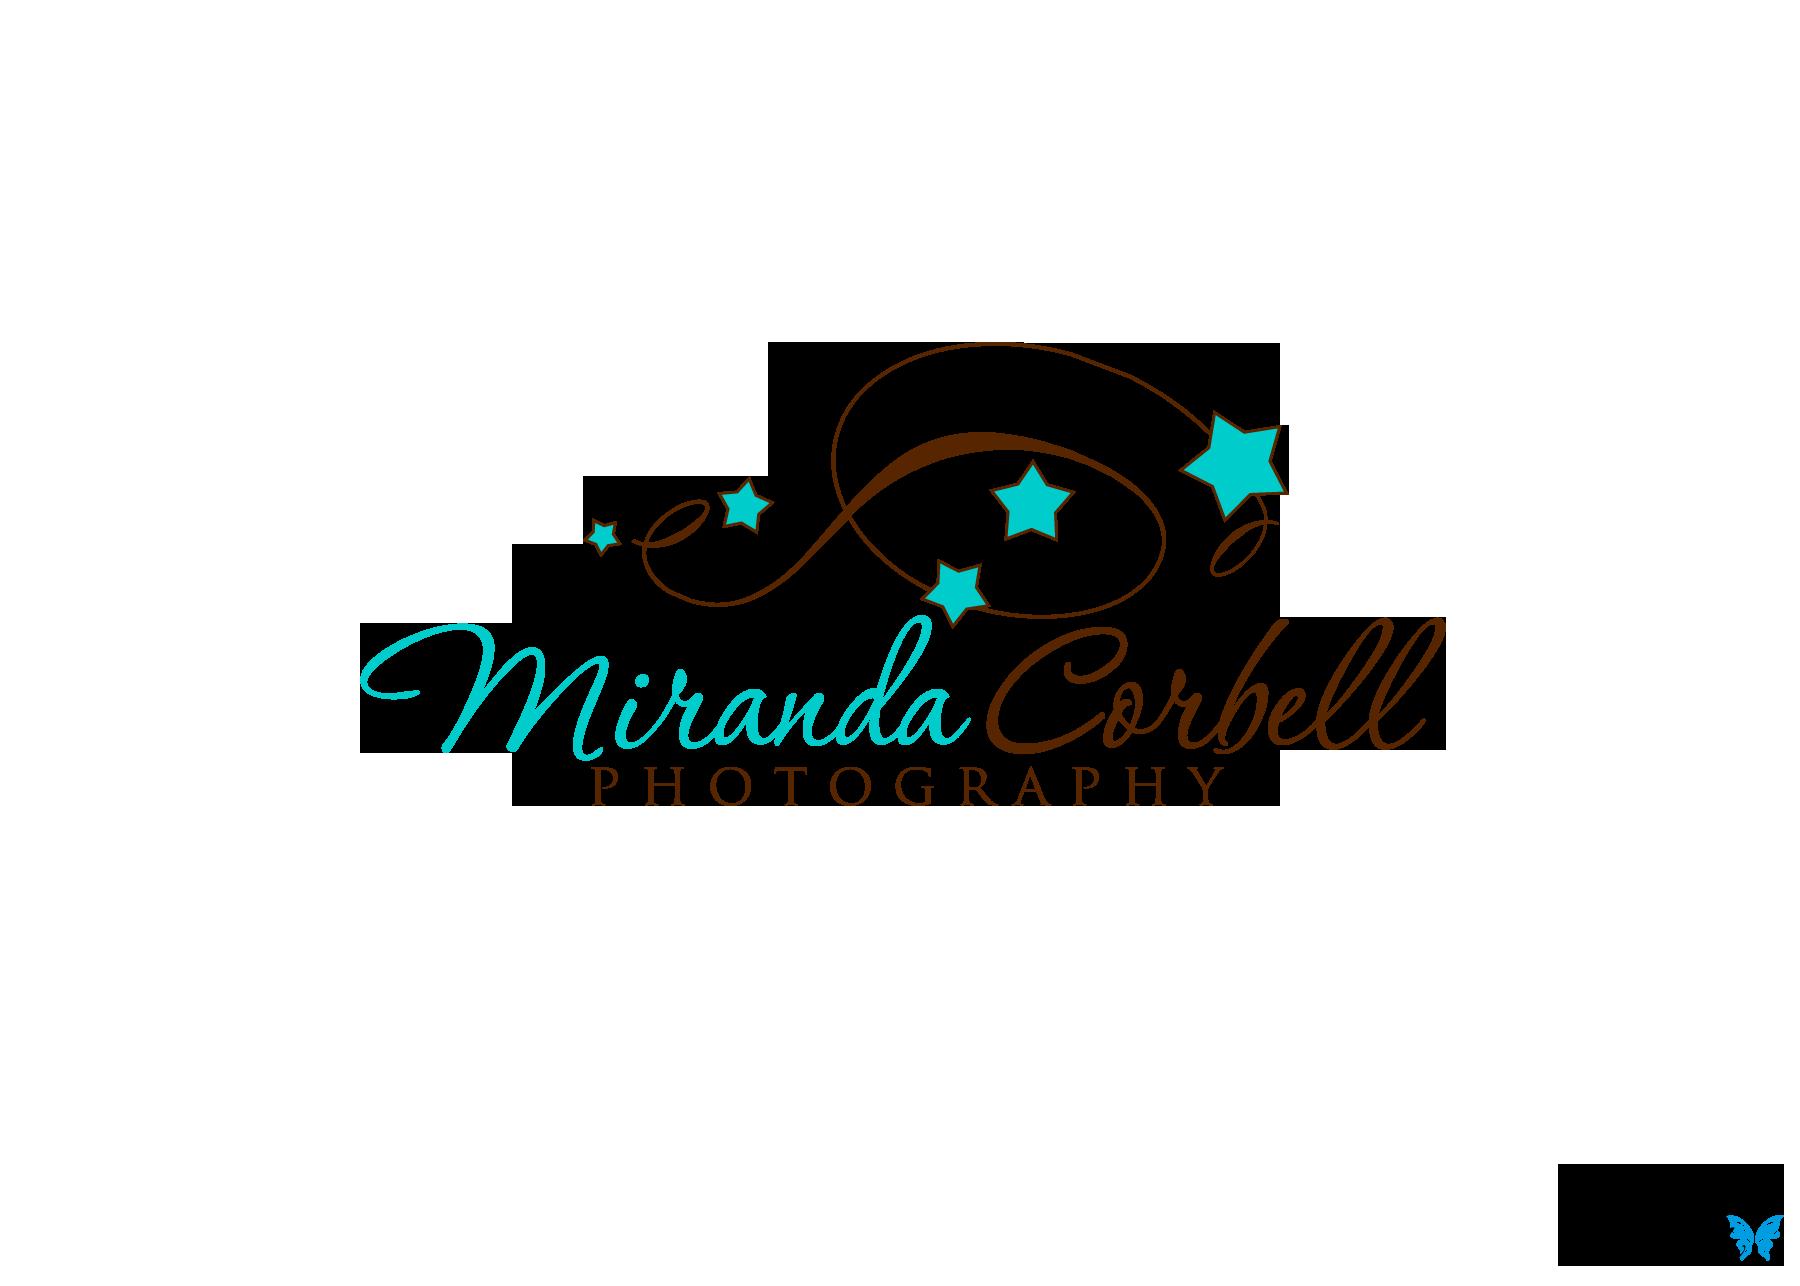 Help Miranda Corbell Photography with a new logo